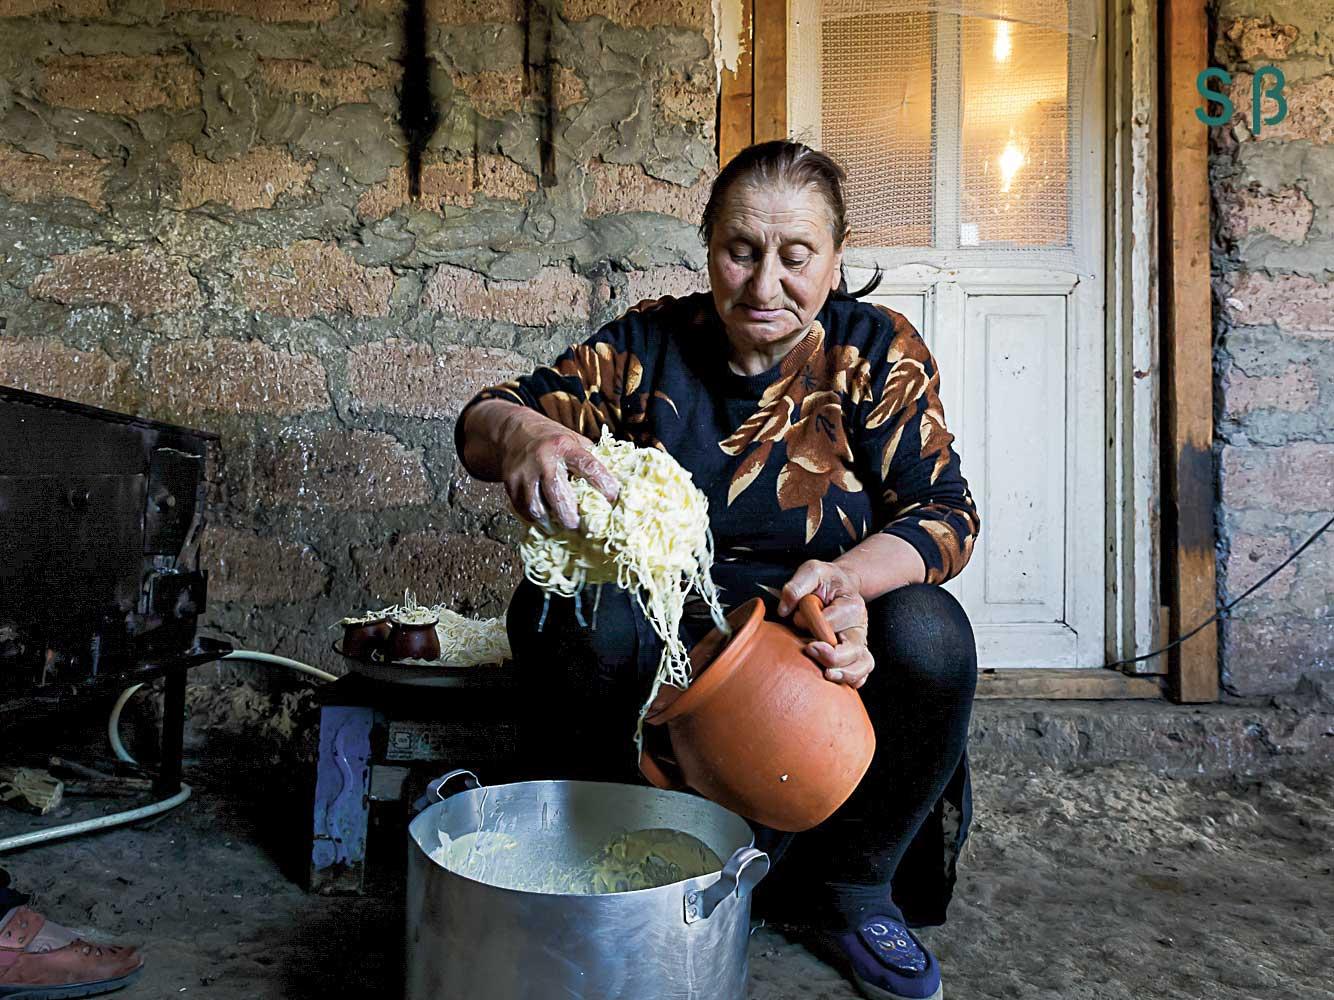 Woman cooking pasta in metal pot.